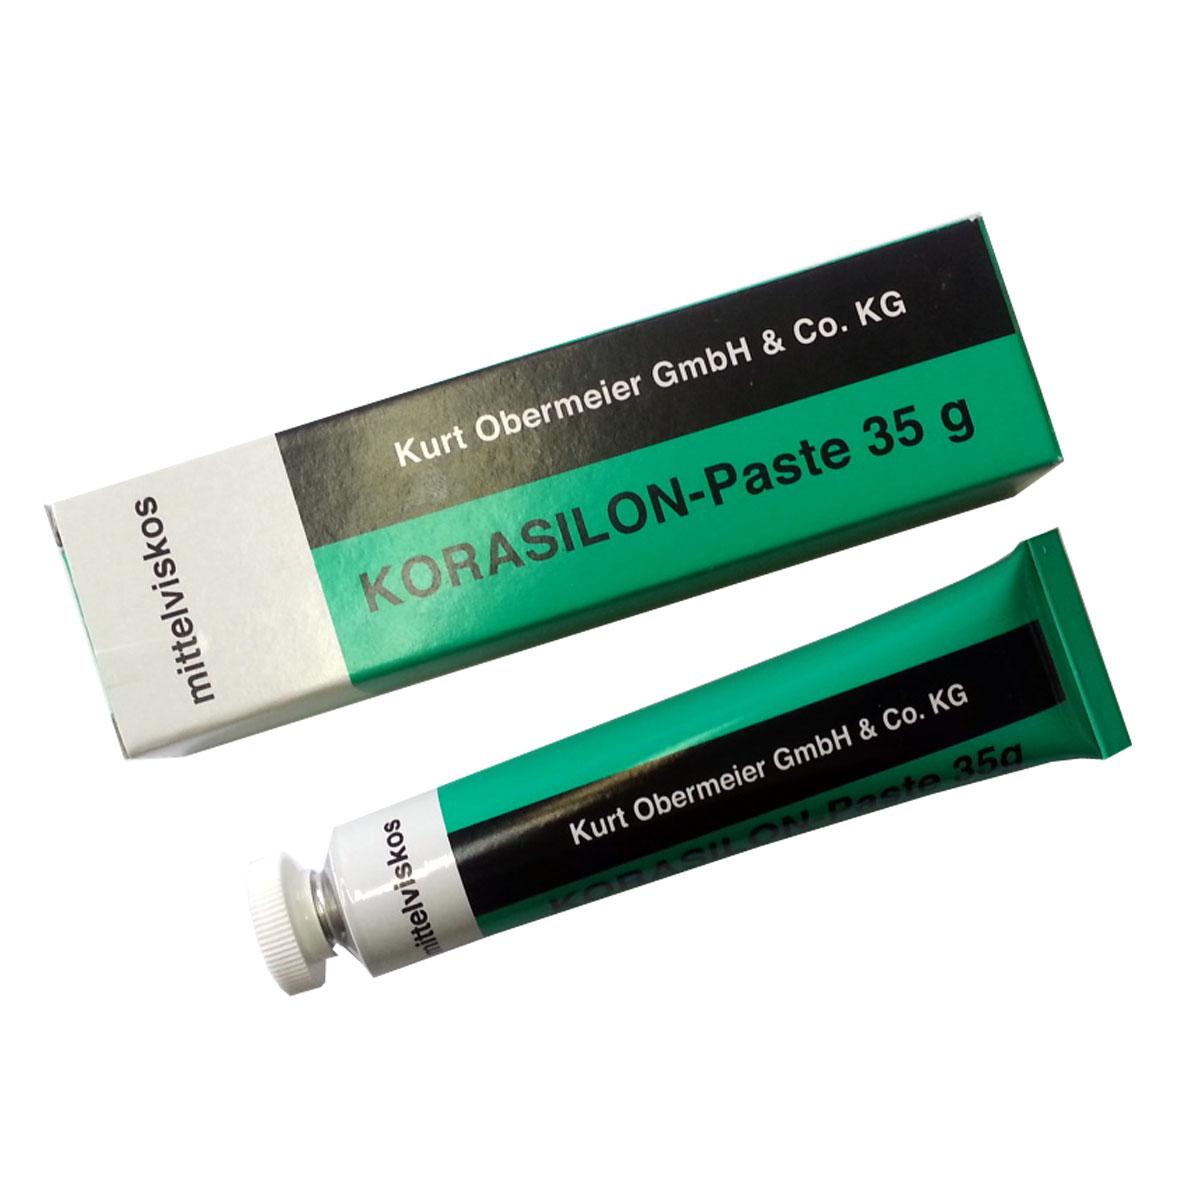 OBERMEIER - Korasilon-Paste mittelviskos 35 g Silikonschmiermittel